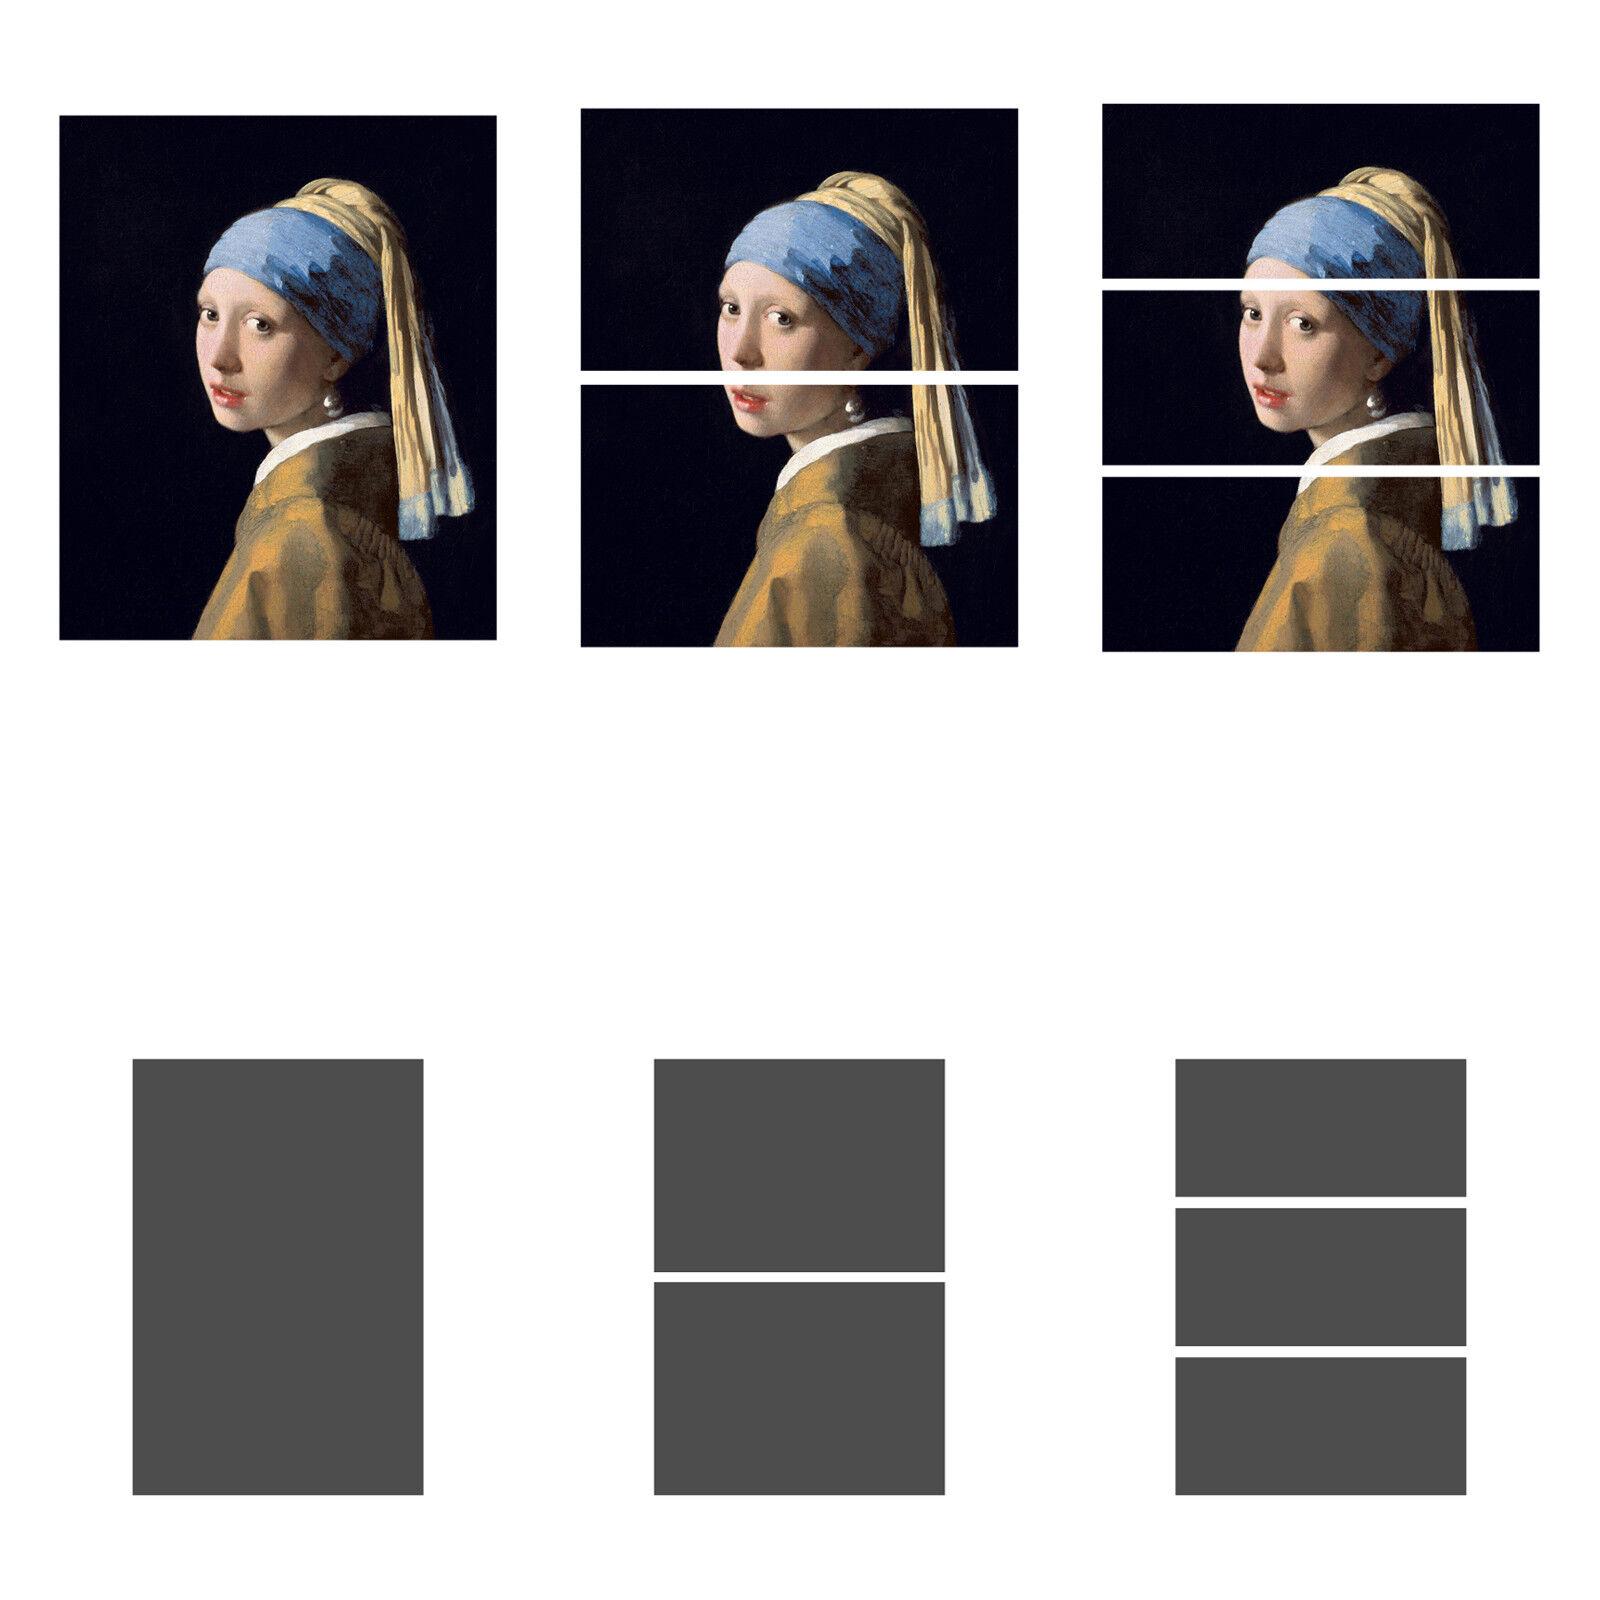 Vermeer dipinto la ragazza col turbante quadro stampa tela dipinto Vermeer telaio arRouge o casa f24f06